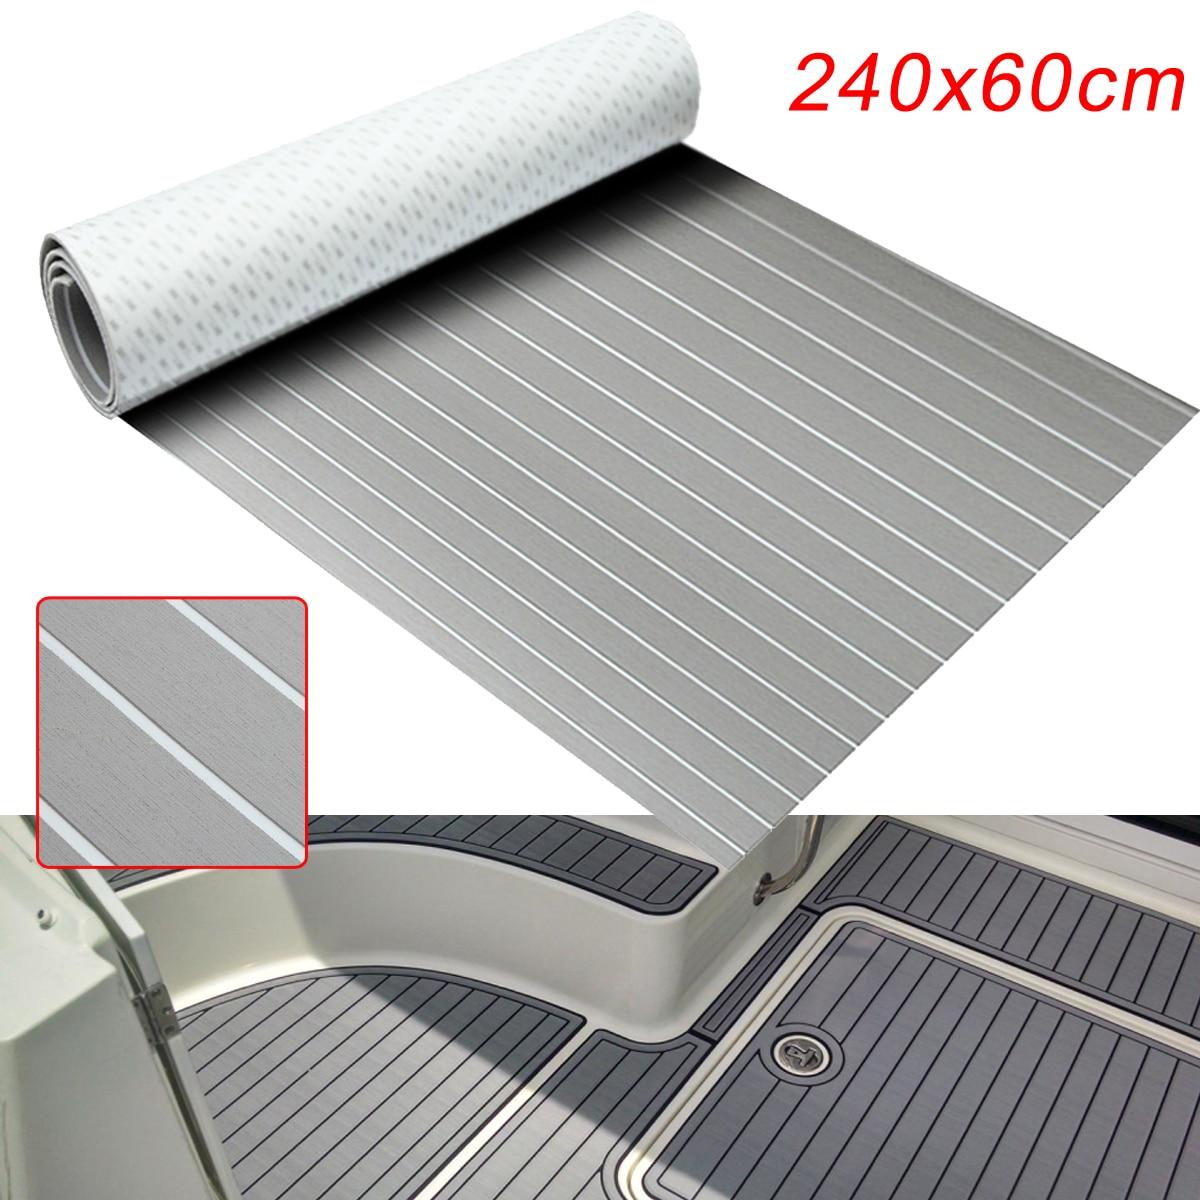 600x2400x6.5mm Self-Adhesive Marine Flooring Faux Teak EVA Foam Boat Decking Sheet